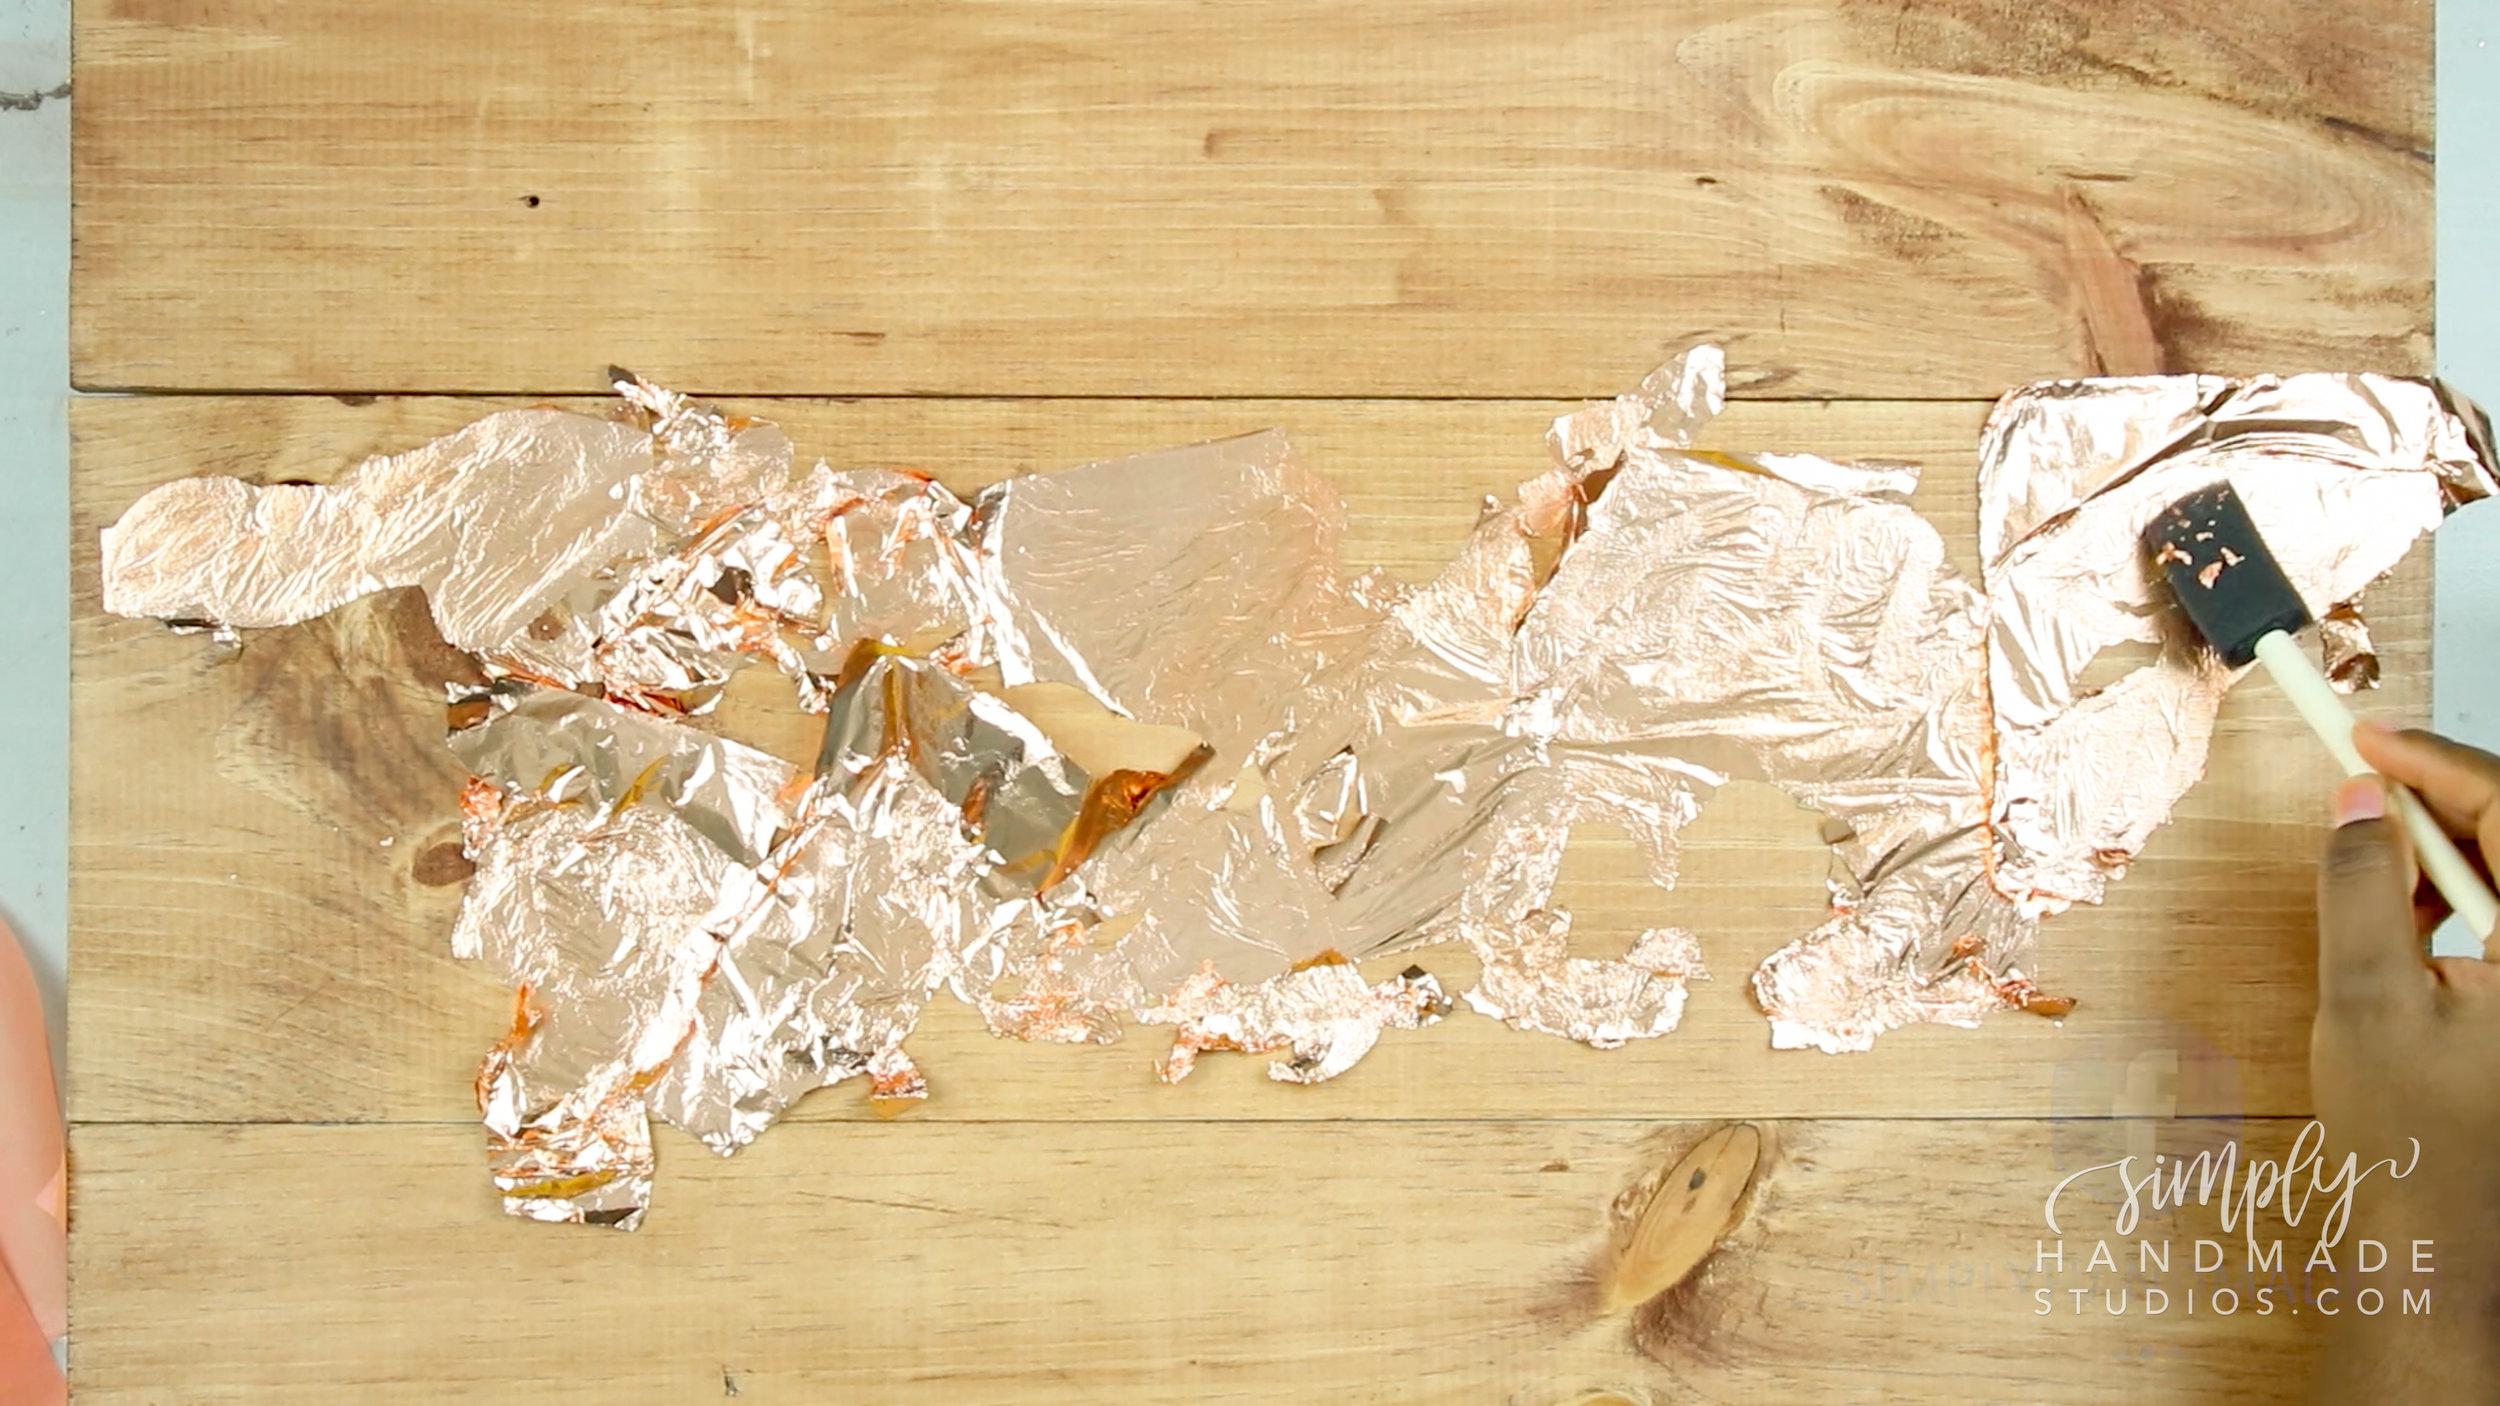 Art | Metallic Gold Contemporary Art - Simply Handmade Studios